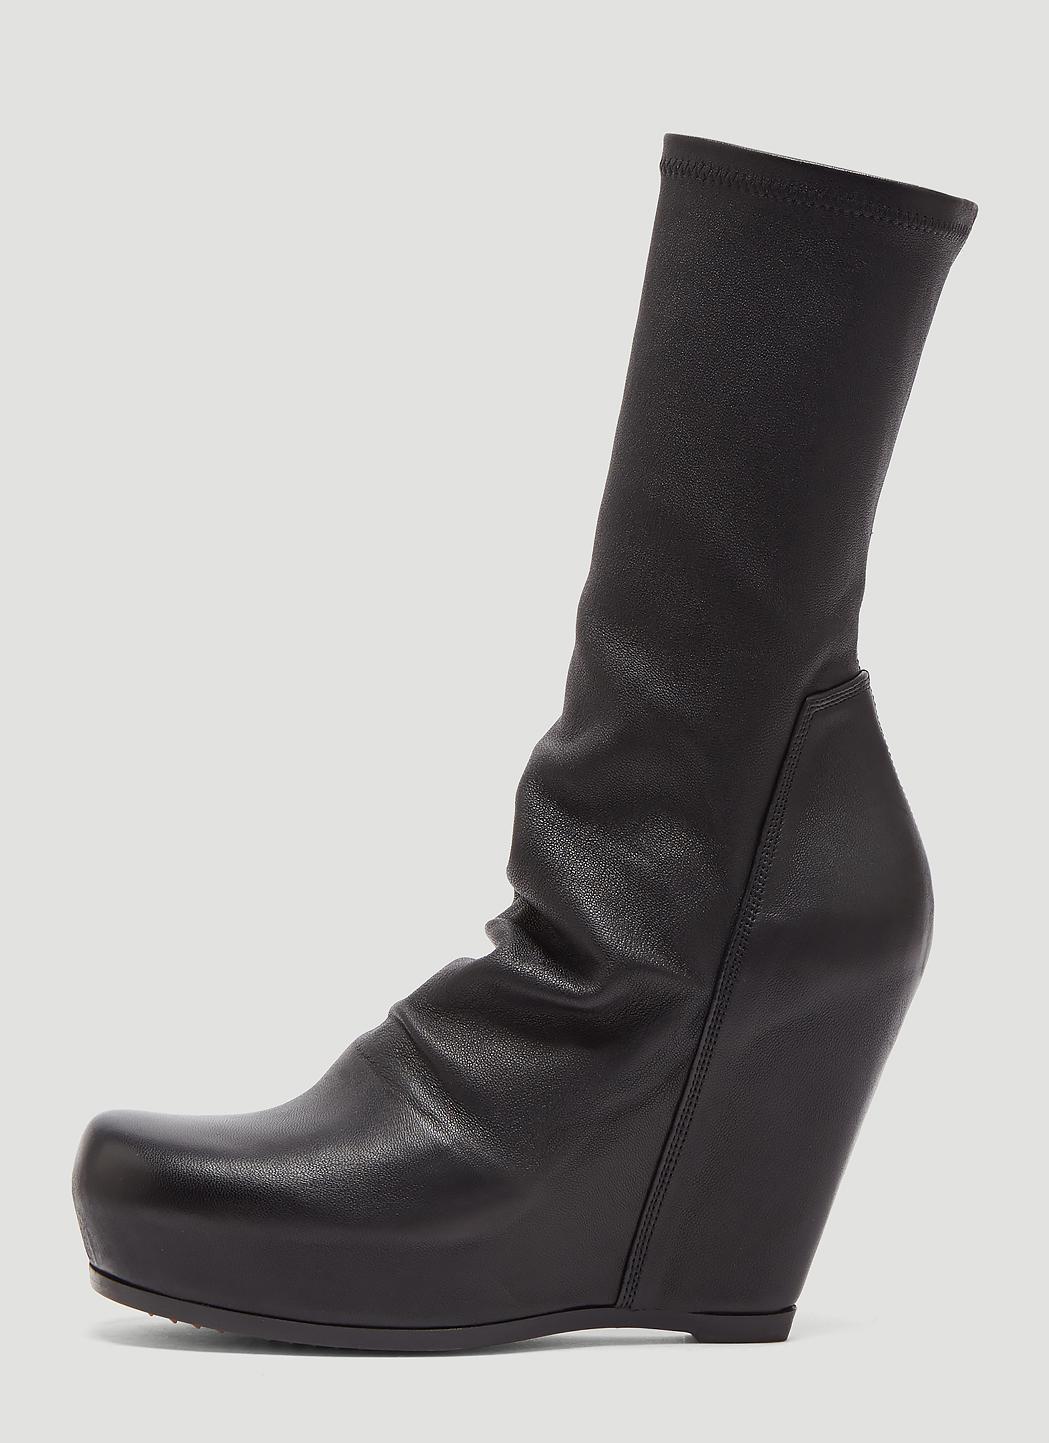 d41bebd35900 Rick Owens - Sock Wedge Boots In Black - Lyst. View fullscreen